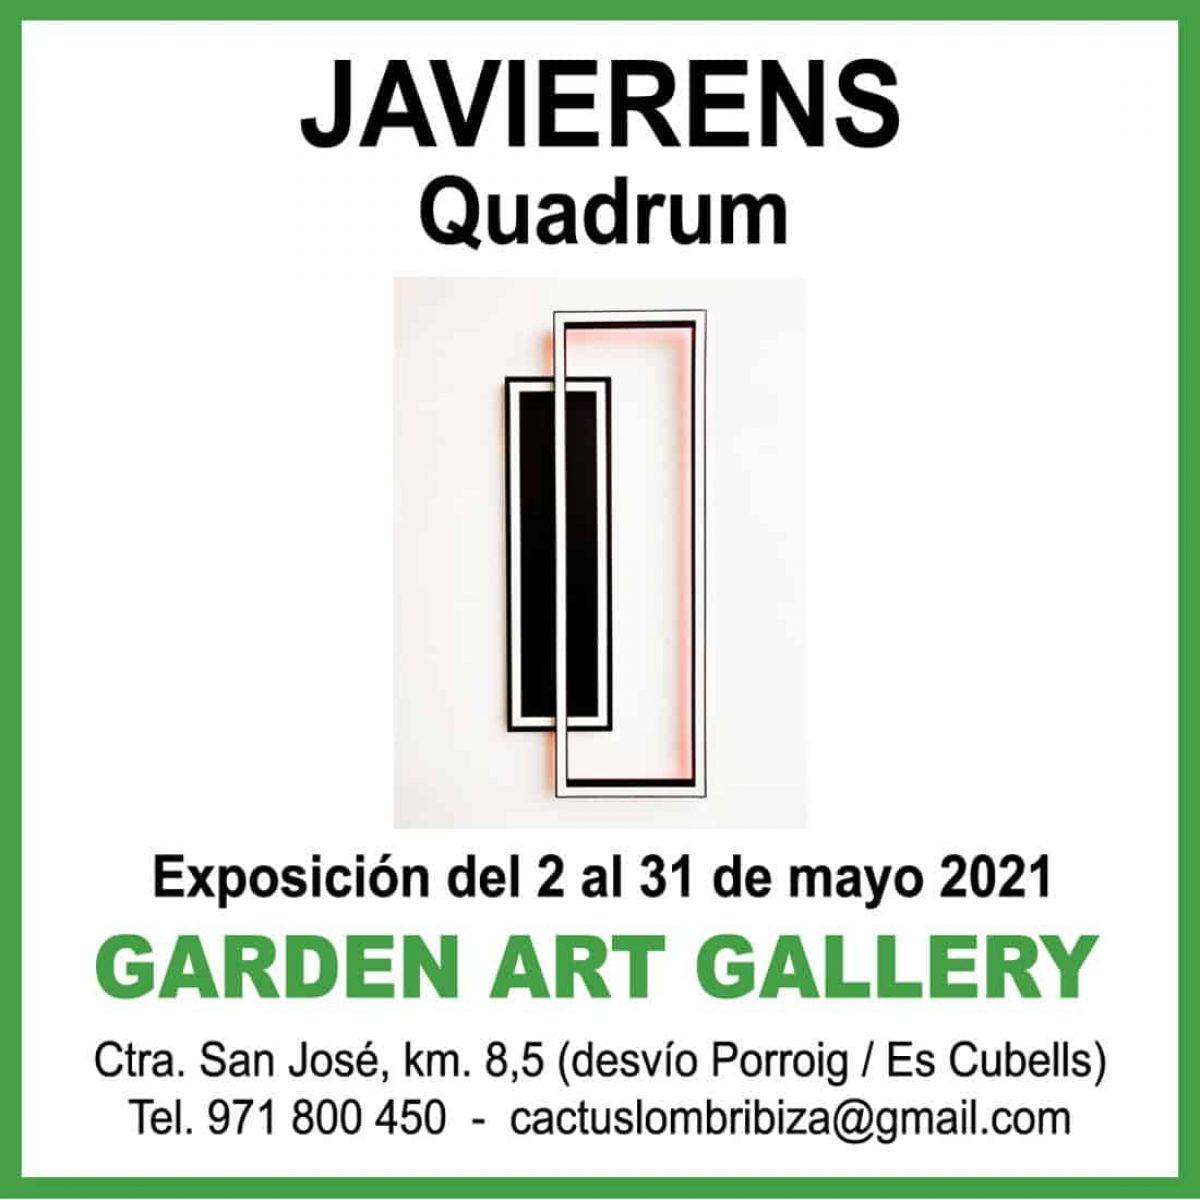 exposicion-quadrum-javierens-garden-art-gallery-ibiza-2021-welcometoibiza